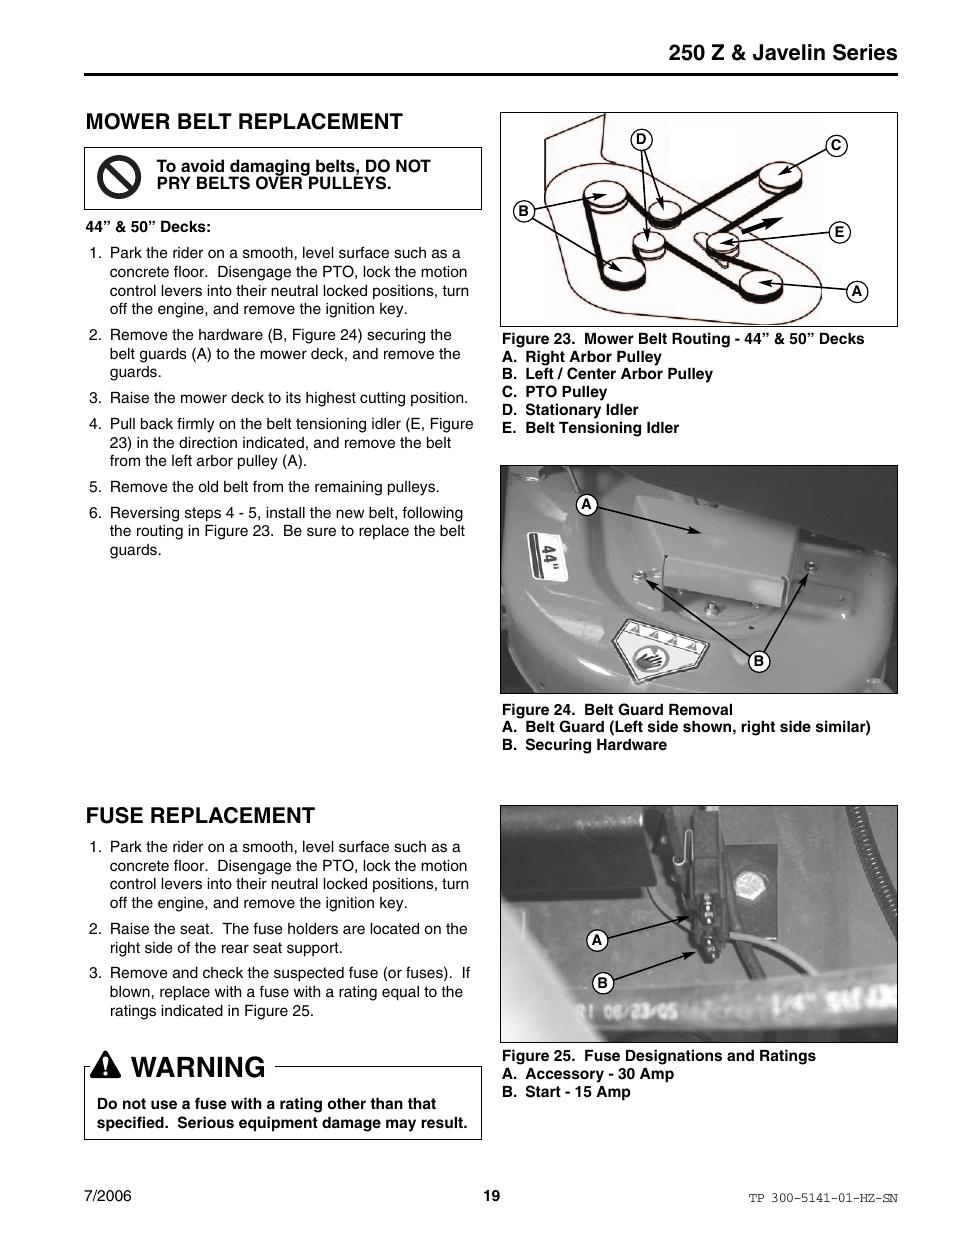 medium resolution of warning 250 z javelin series mower belt replacement simplicity manufacturing rzt22500bve2 user manual page 19 20